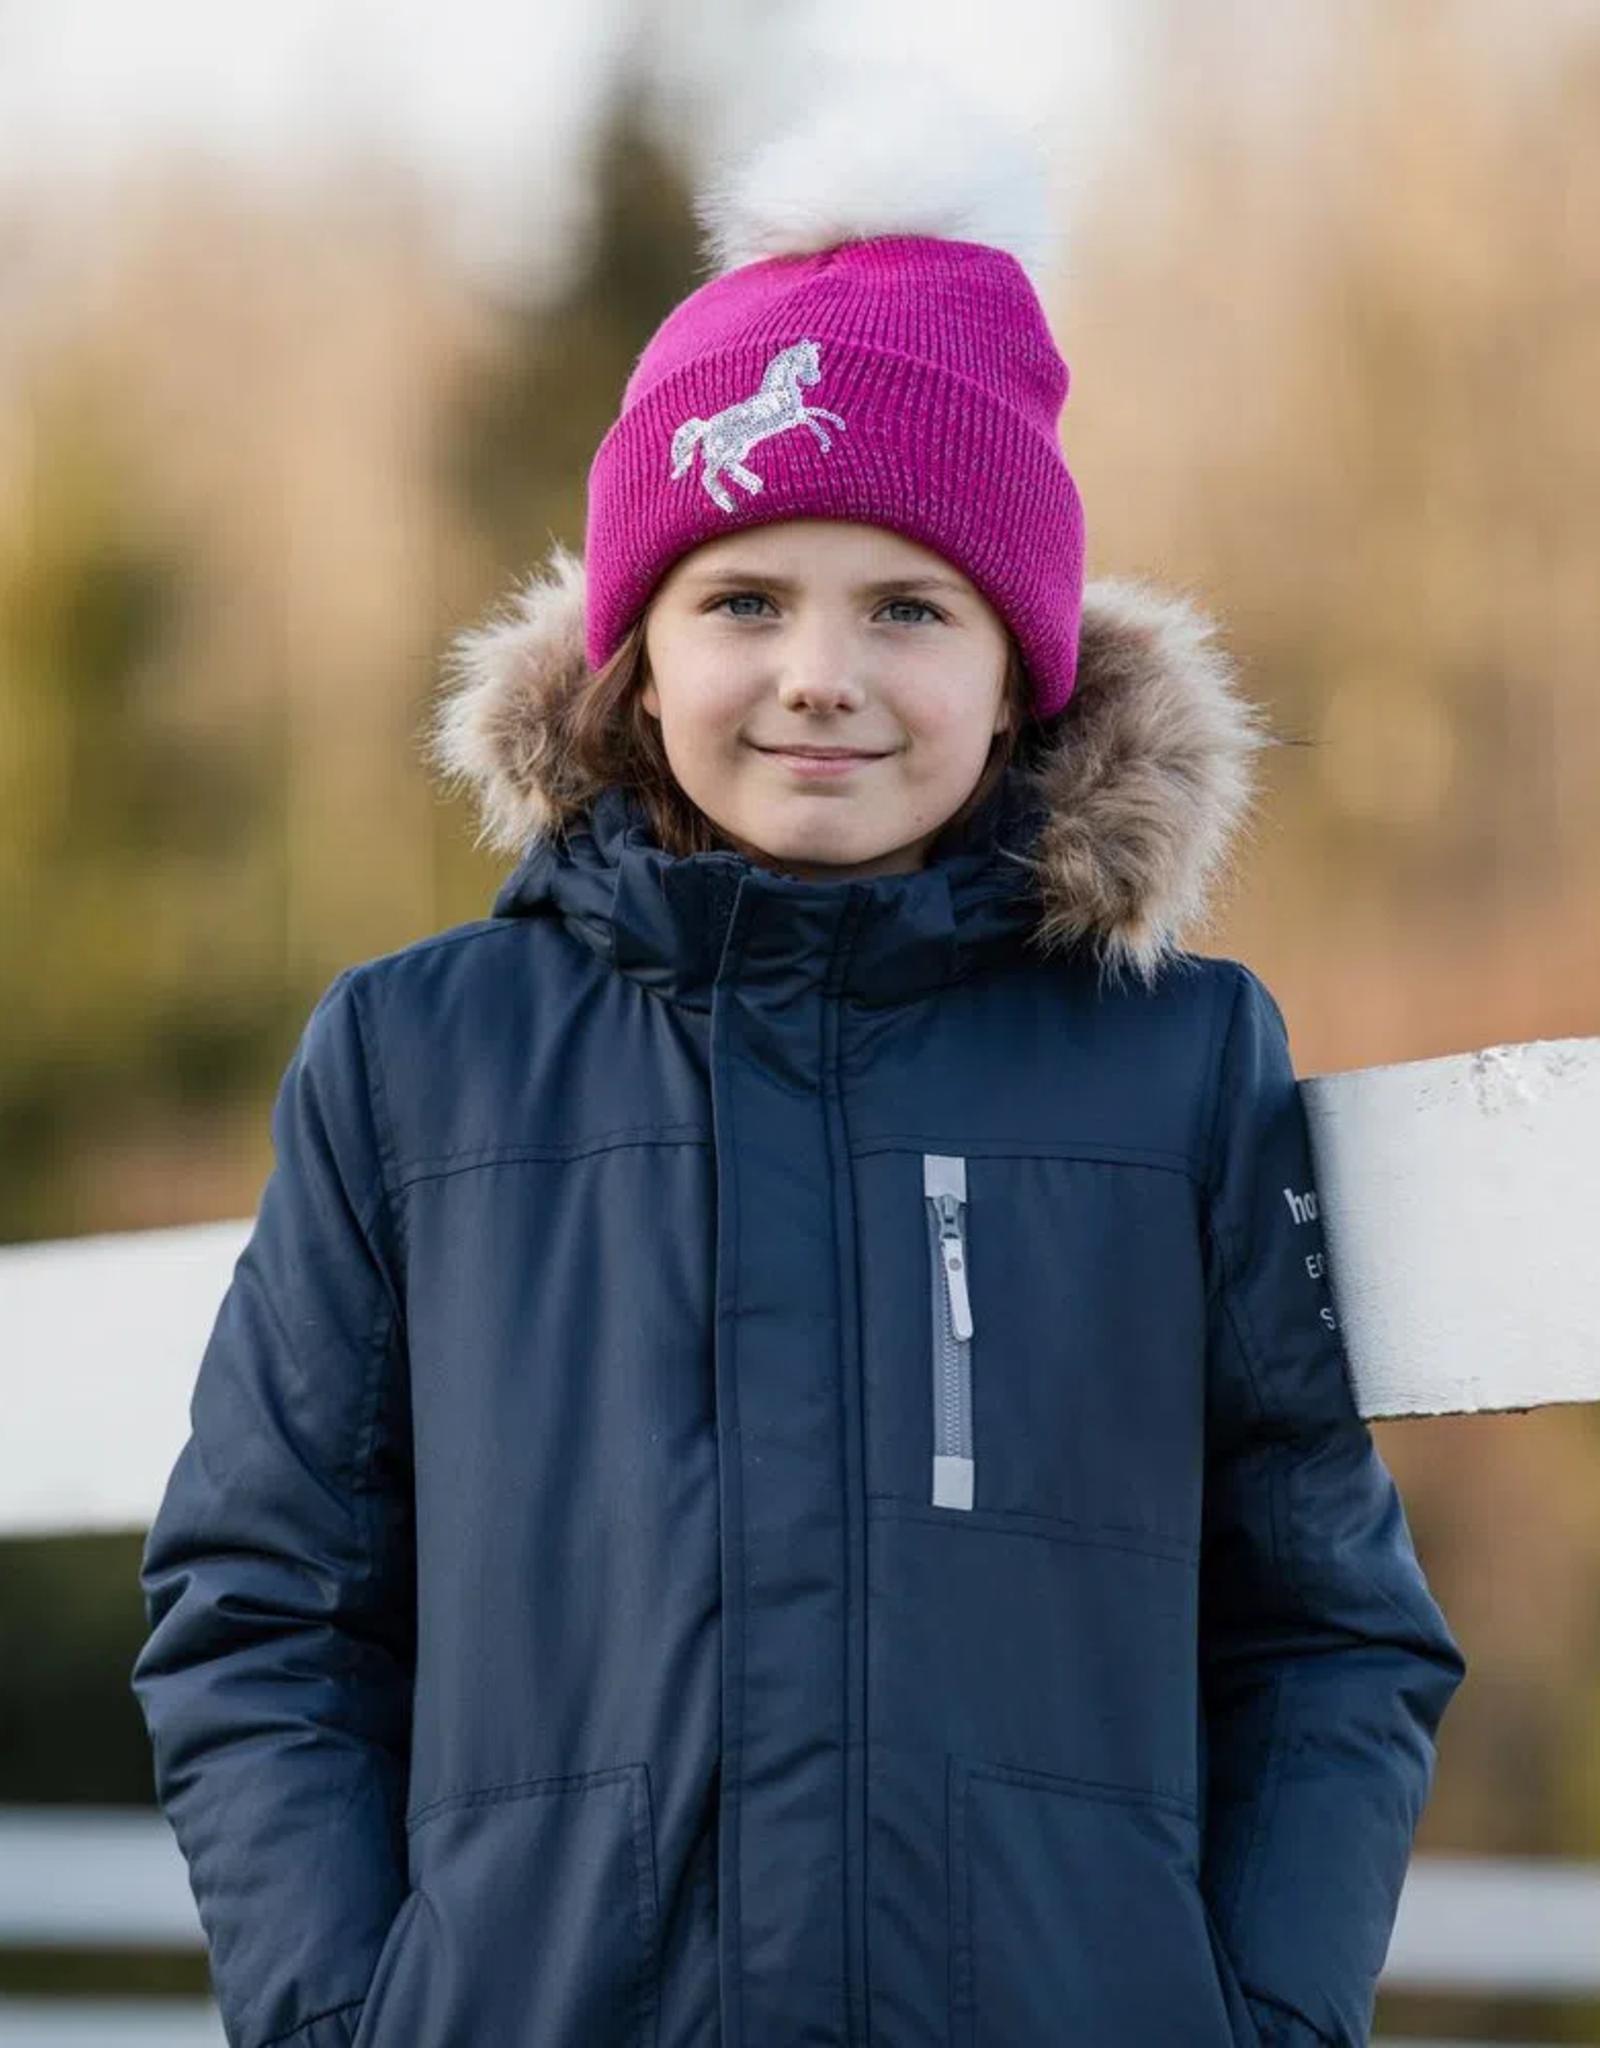 HORZE TERRY KIDS REFLECTIVE KNIT HAT